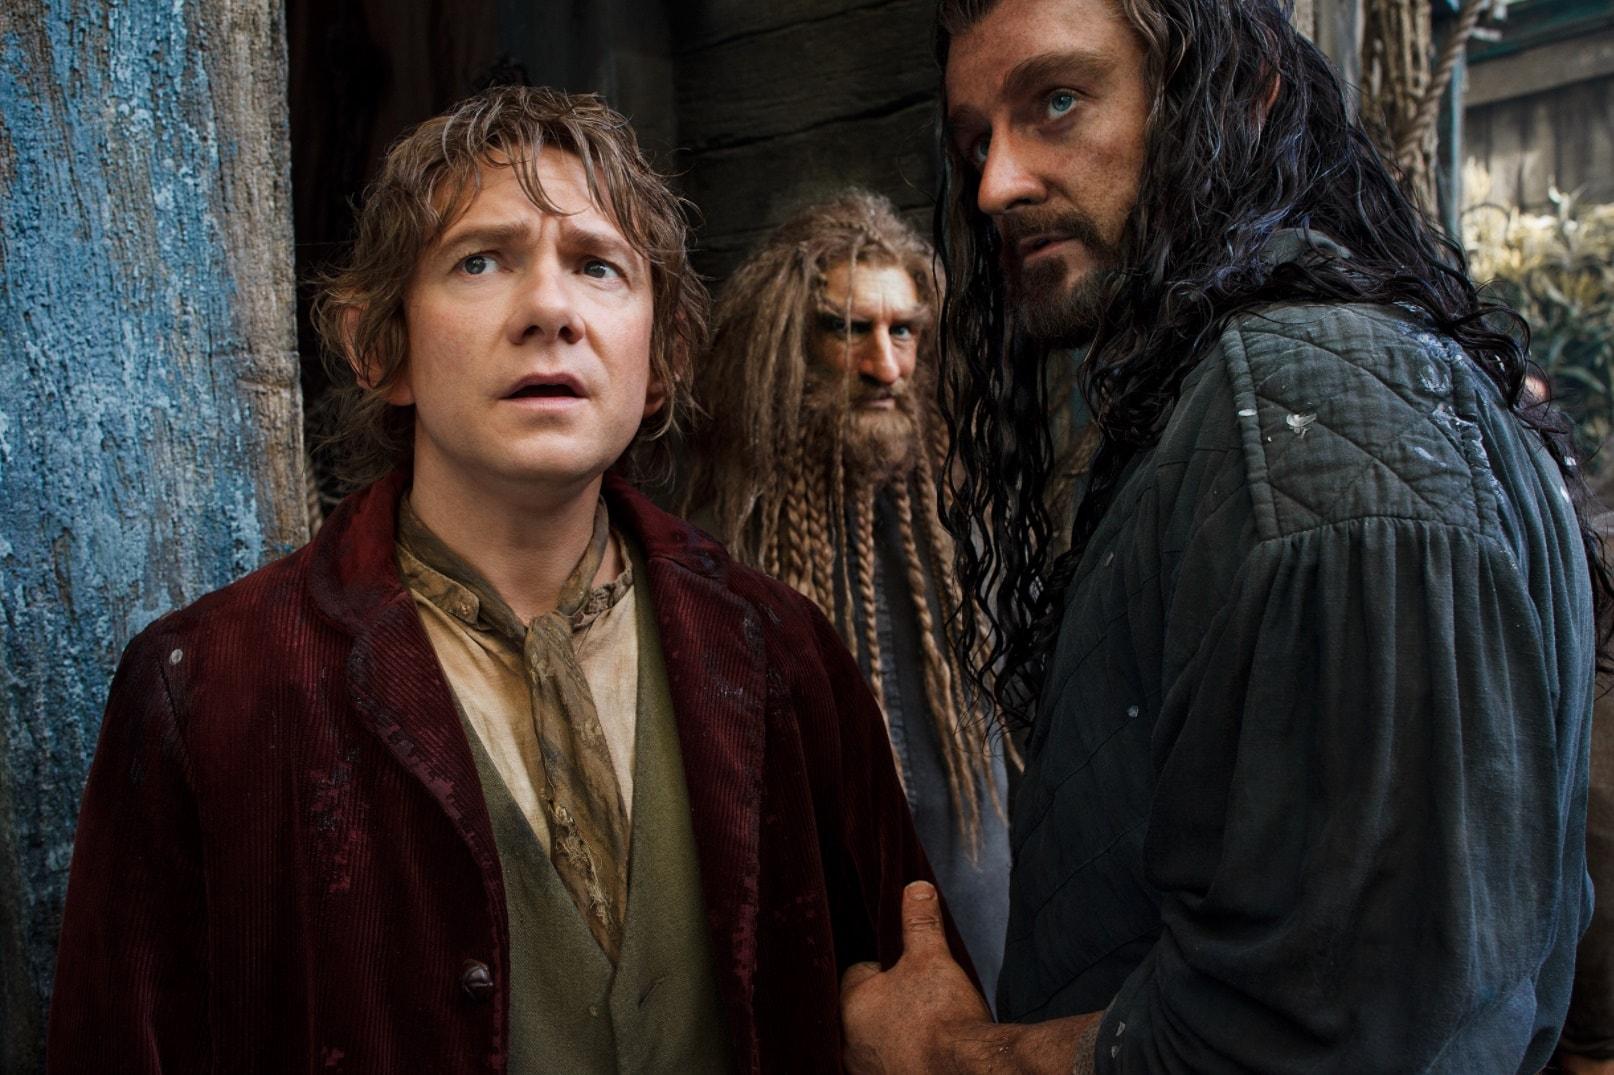 Хоббит: Пустошь Смауга / The Hobbit: The Desolation of Smaug (2013): кадр из фильма